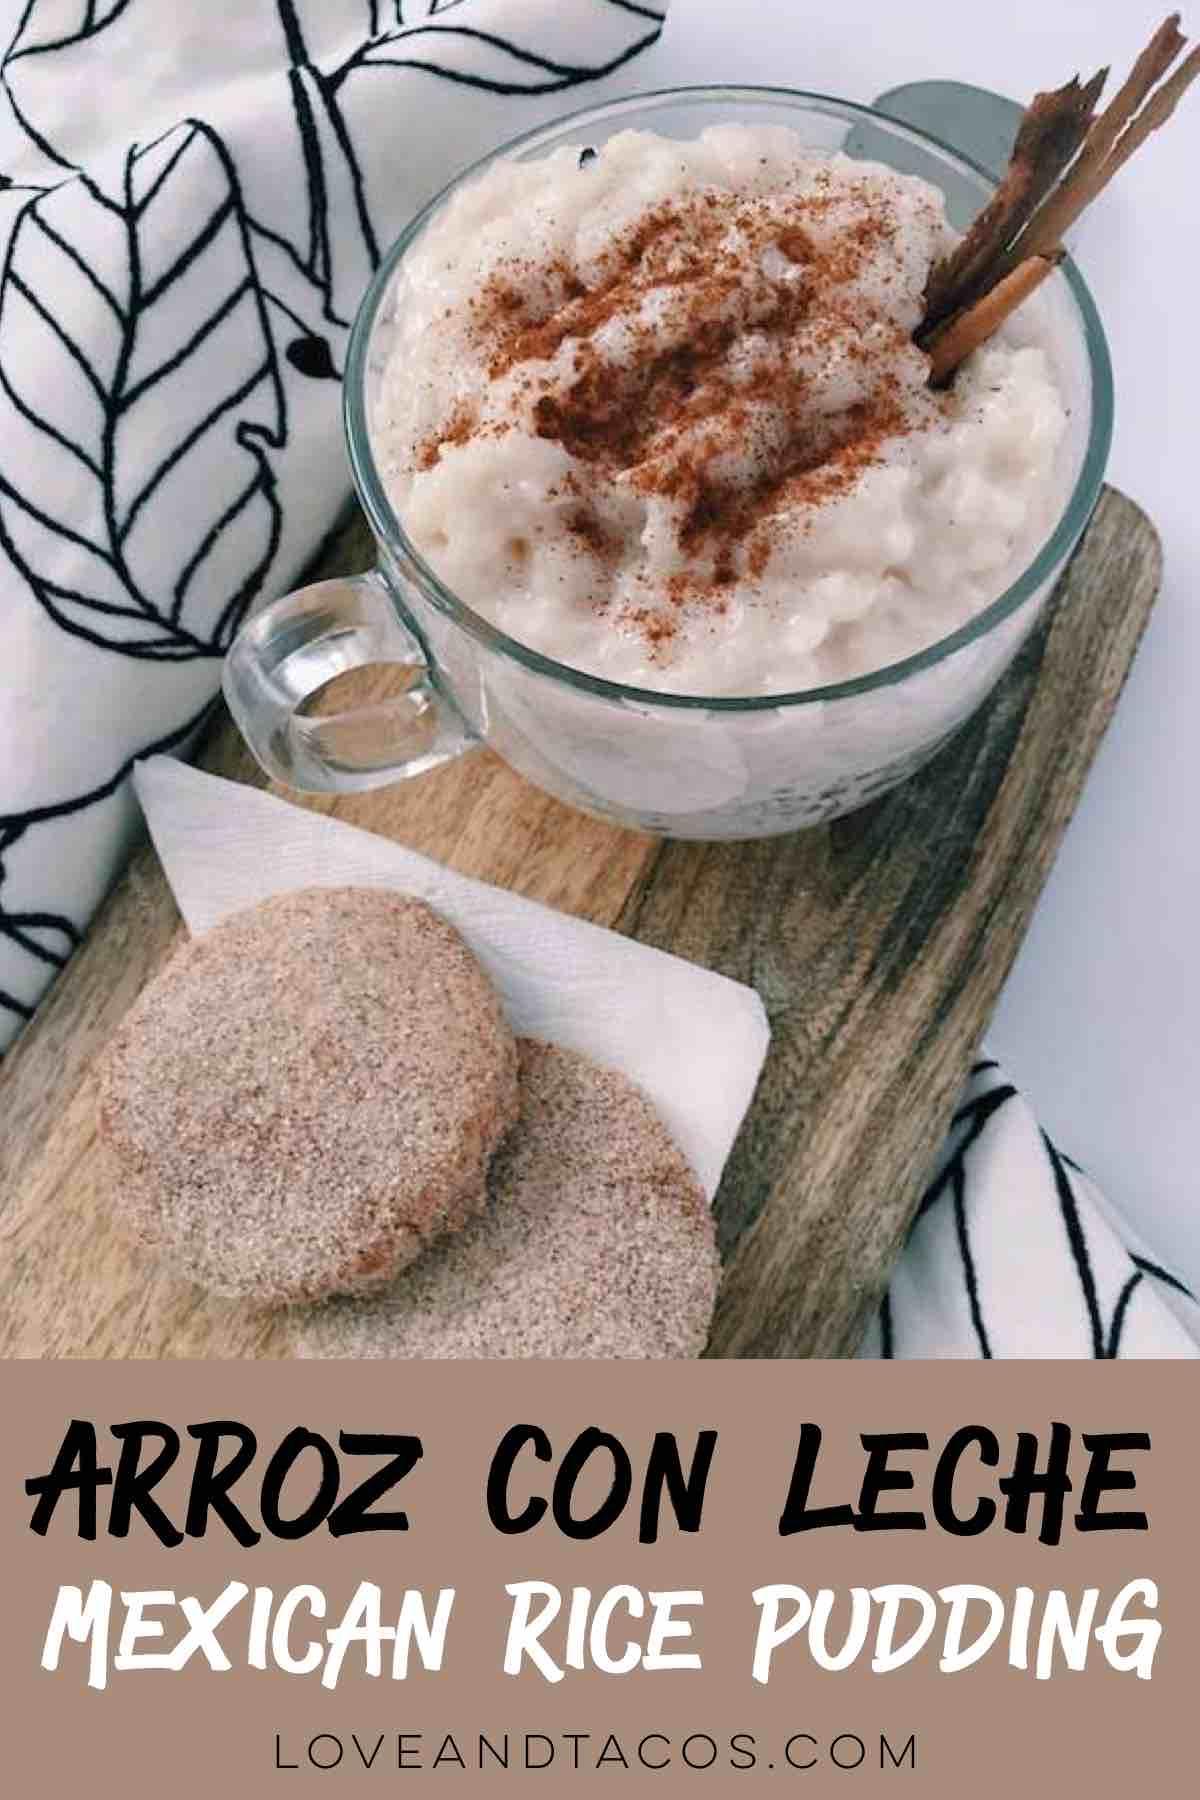 Arroz Con Leche Pinterest Image - Love And Tacos